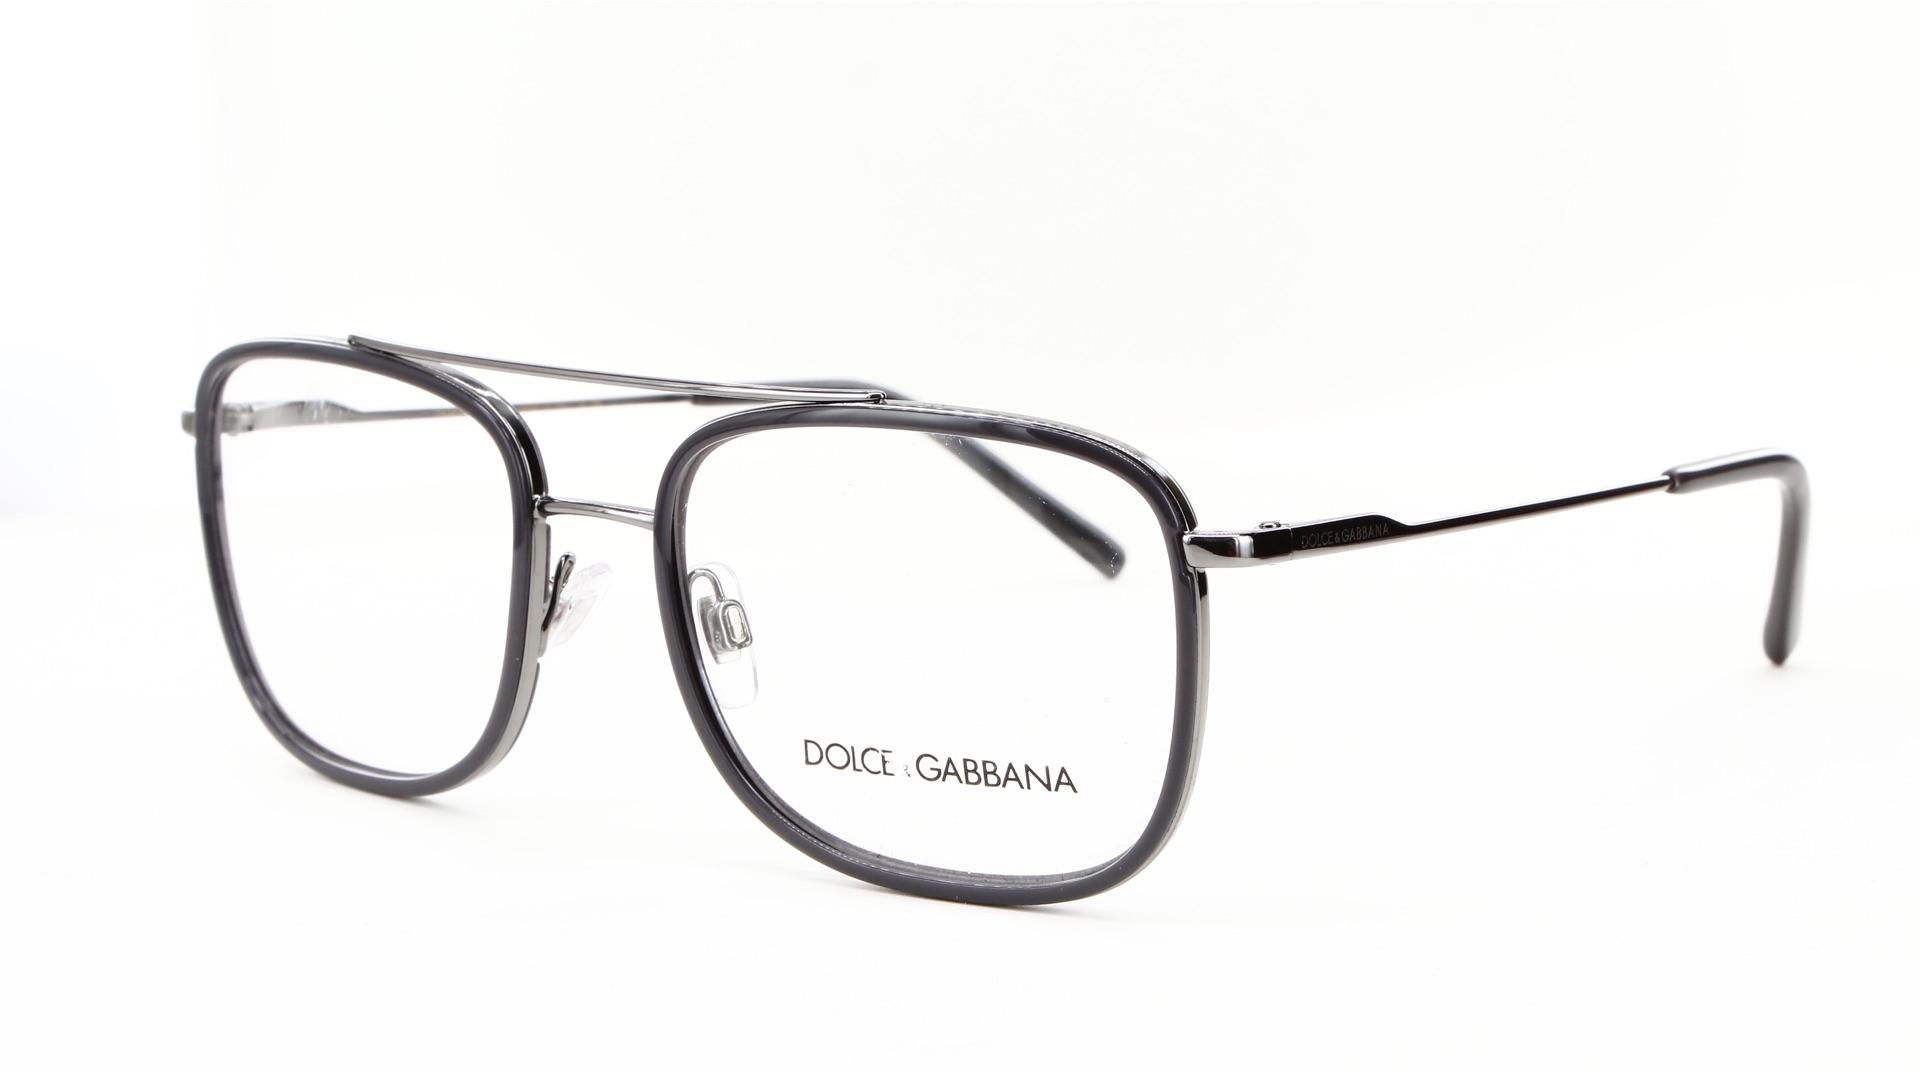 Dolce & Gabbana - ref: 80756